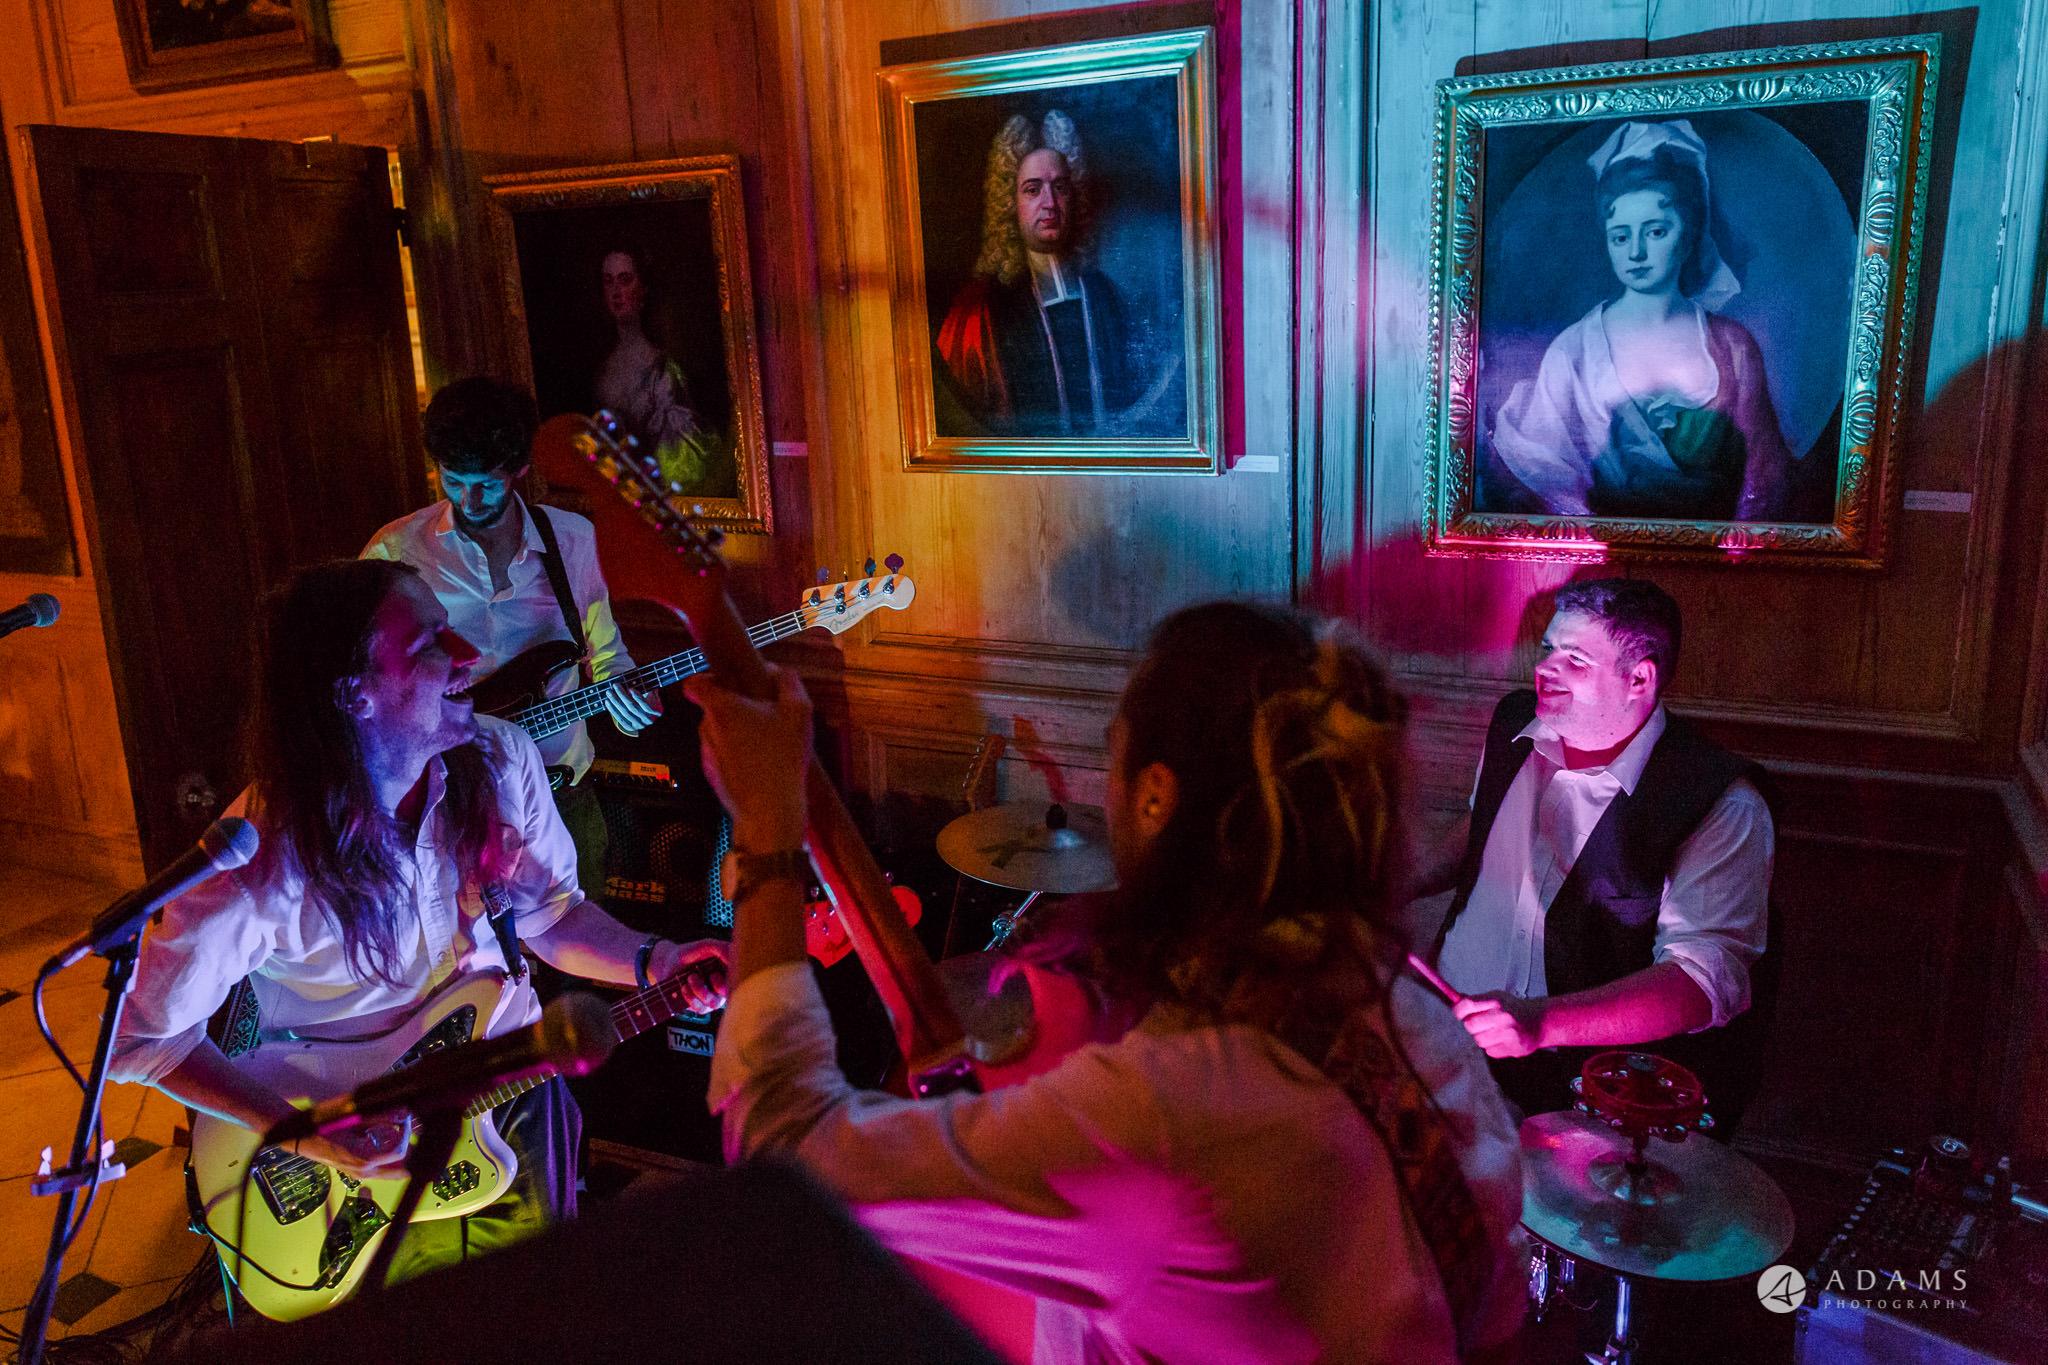 Trinity College Cambridge wedding band playing